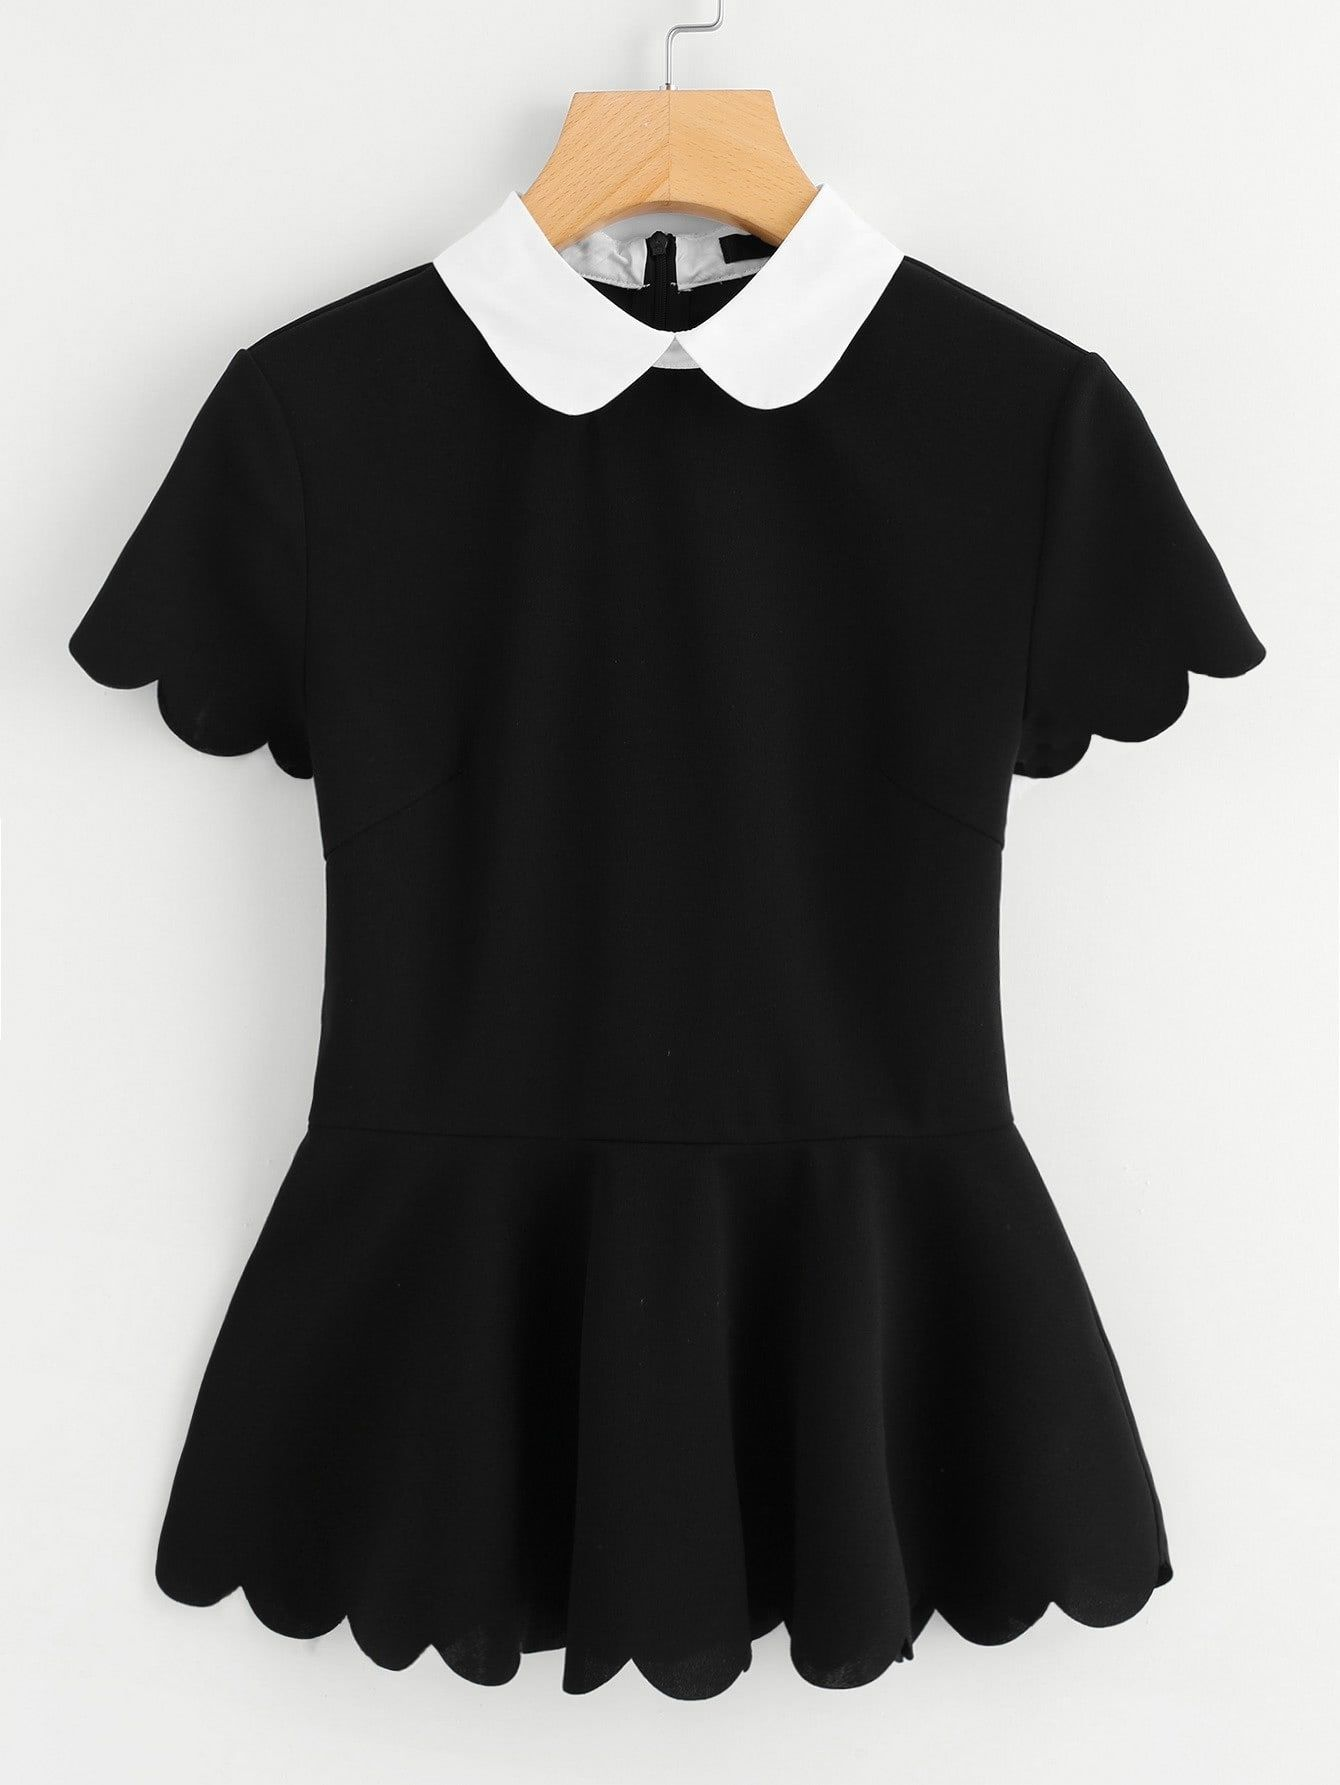 97ed4509576c Elegant Peplum Slim Fit Collar Short Sleeve Black Contrast Peter Pan Collar  Scallop Peplum Top